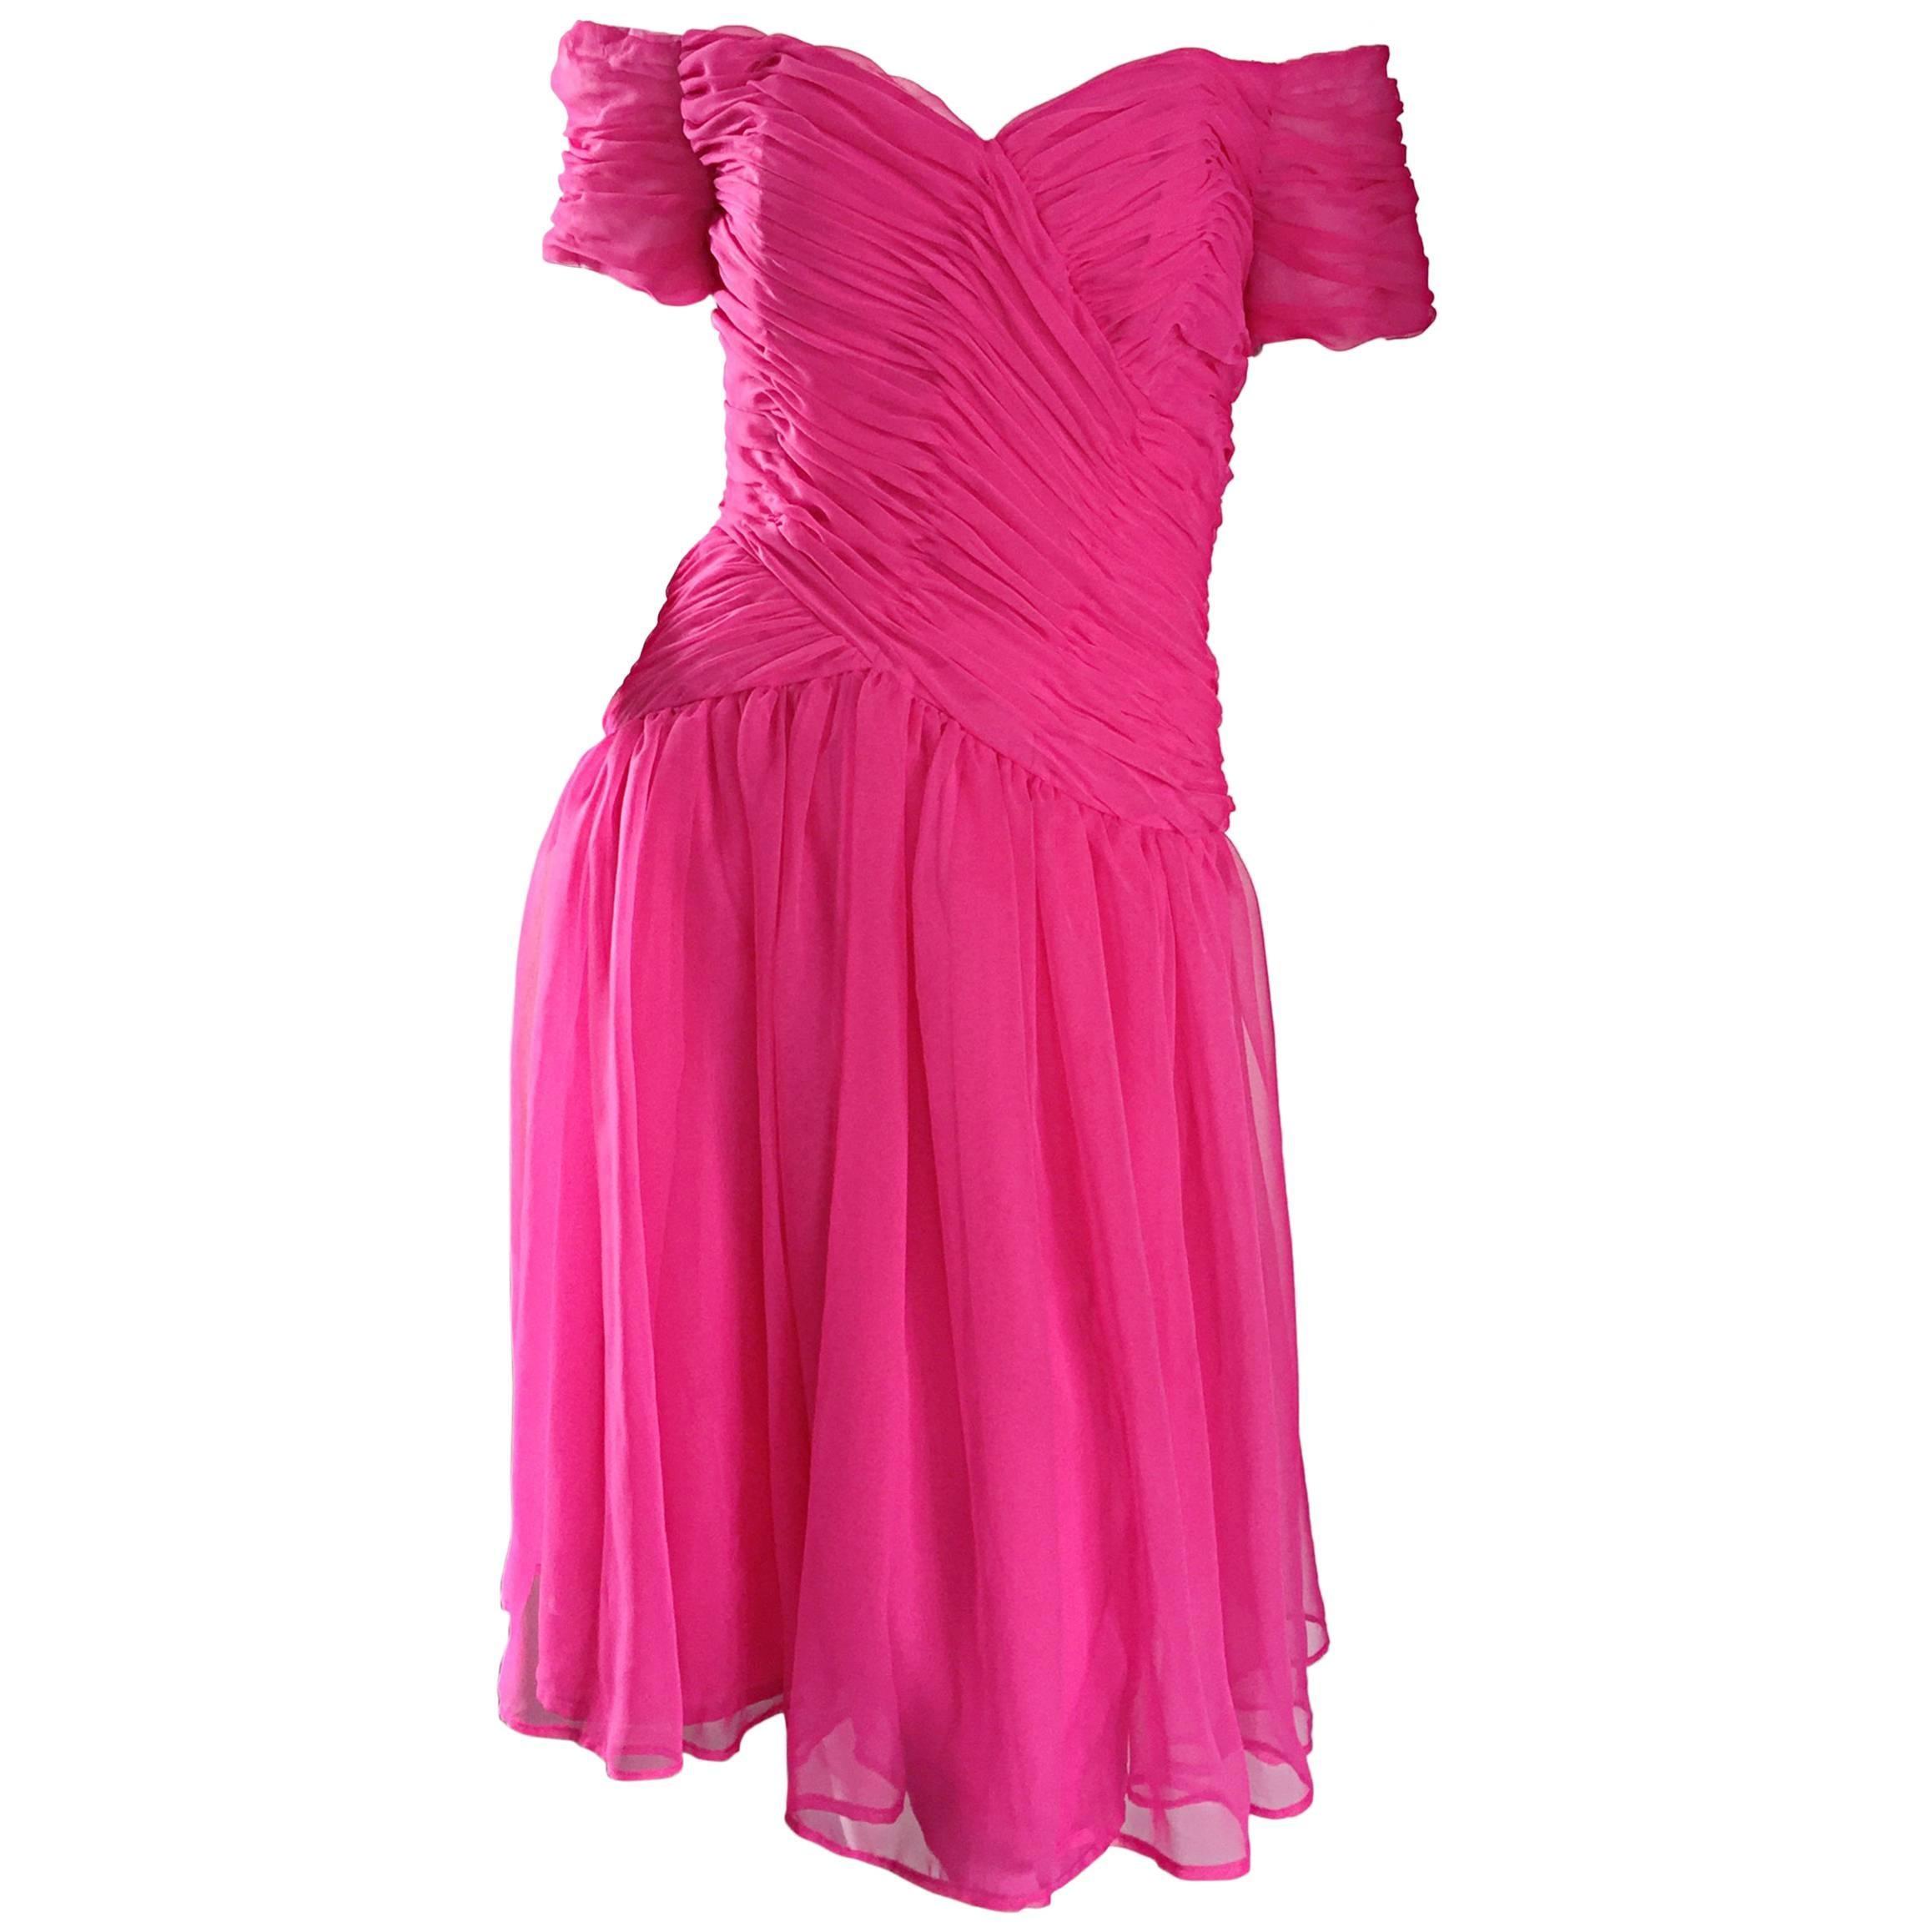 Victor Costa For Bergdorf Goodman Vintage Hot Pink Chiffon Off - Shoulder Dress